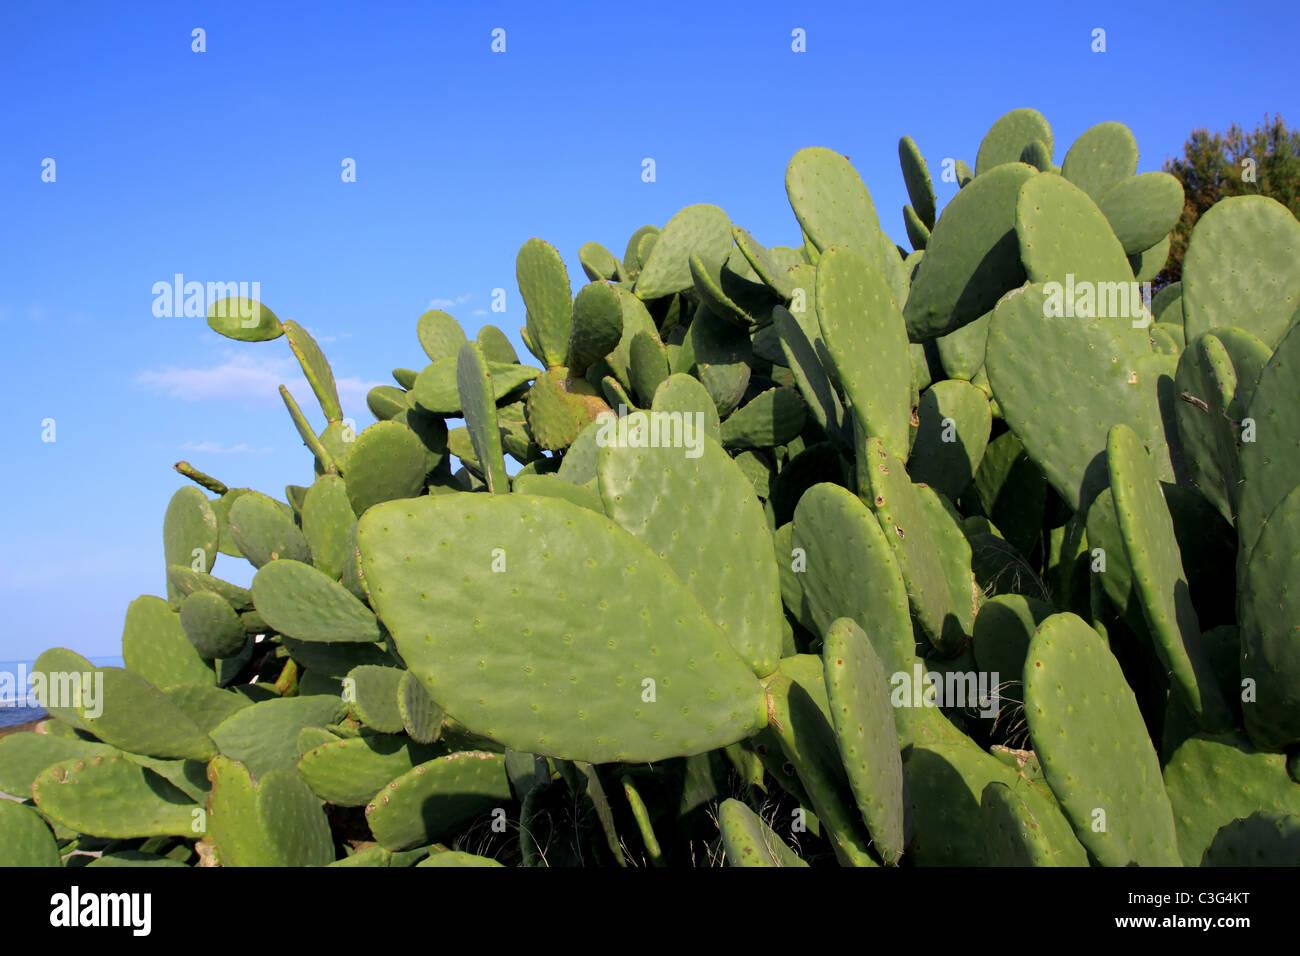 chumbera nopal cactus plant blue sky mediterranean plants - Stock Image